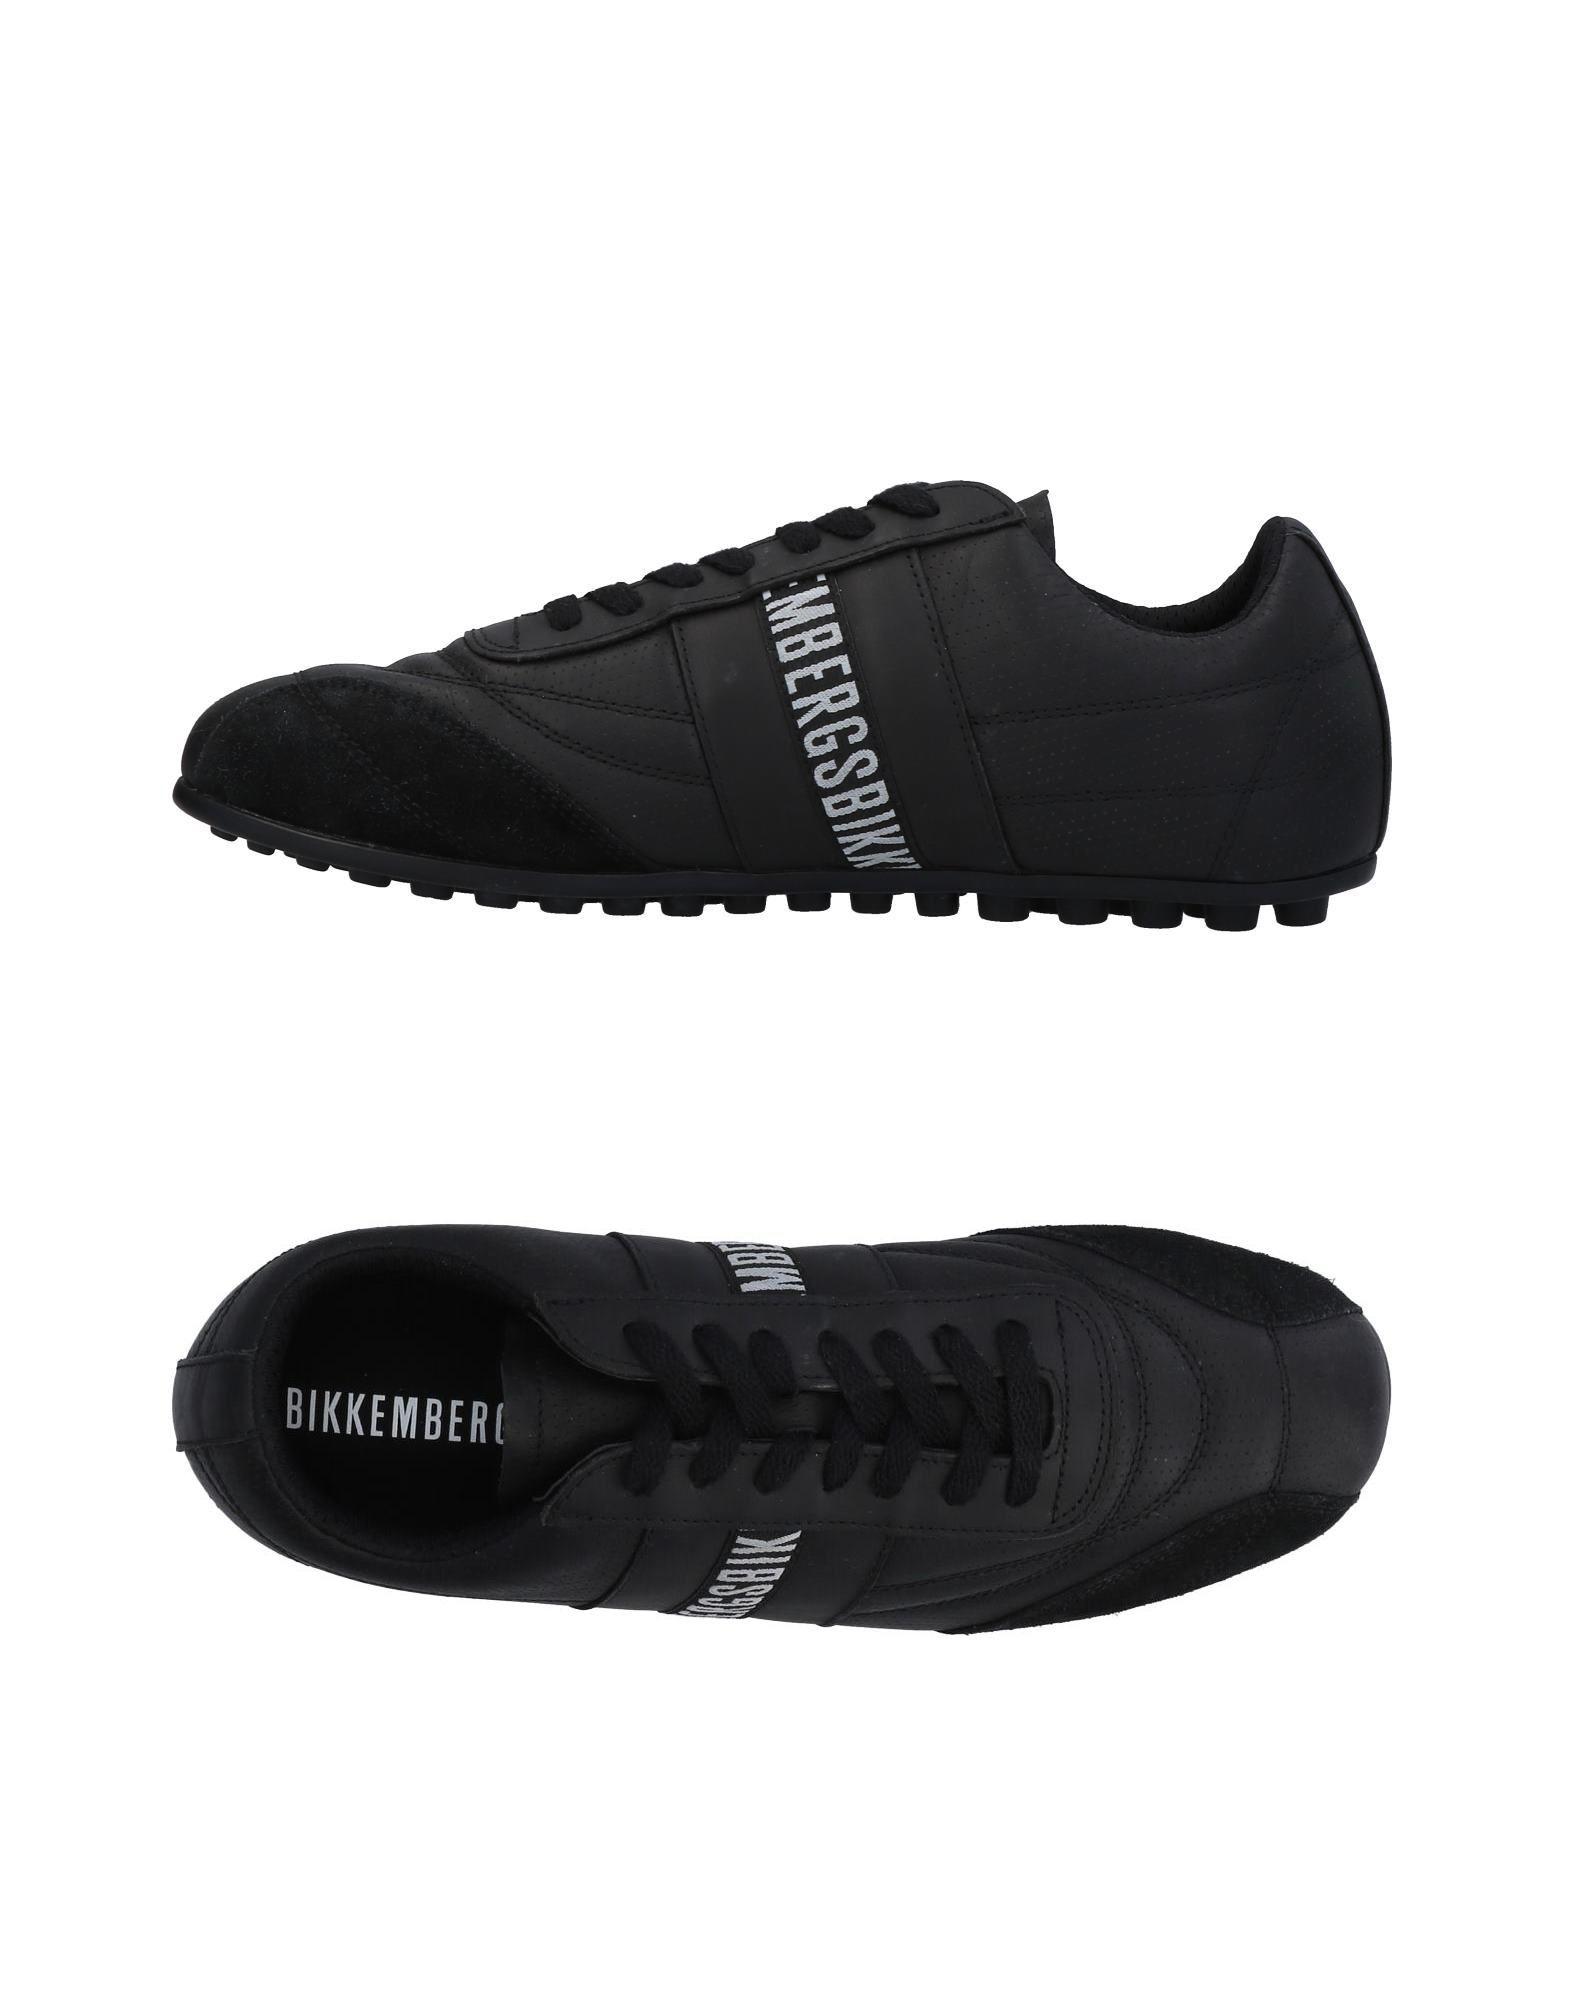 Bikkembergs Sneakers Herren  11451021LV Gute Qualität beliebte Schuhe